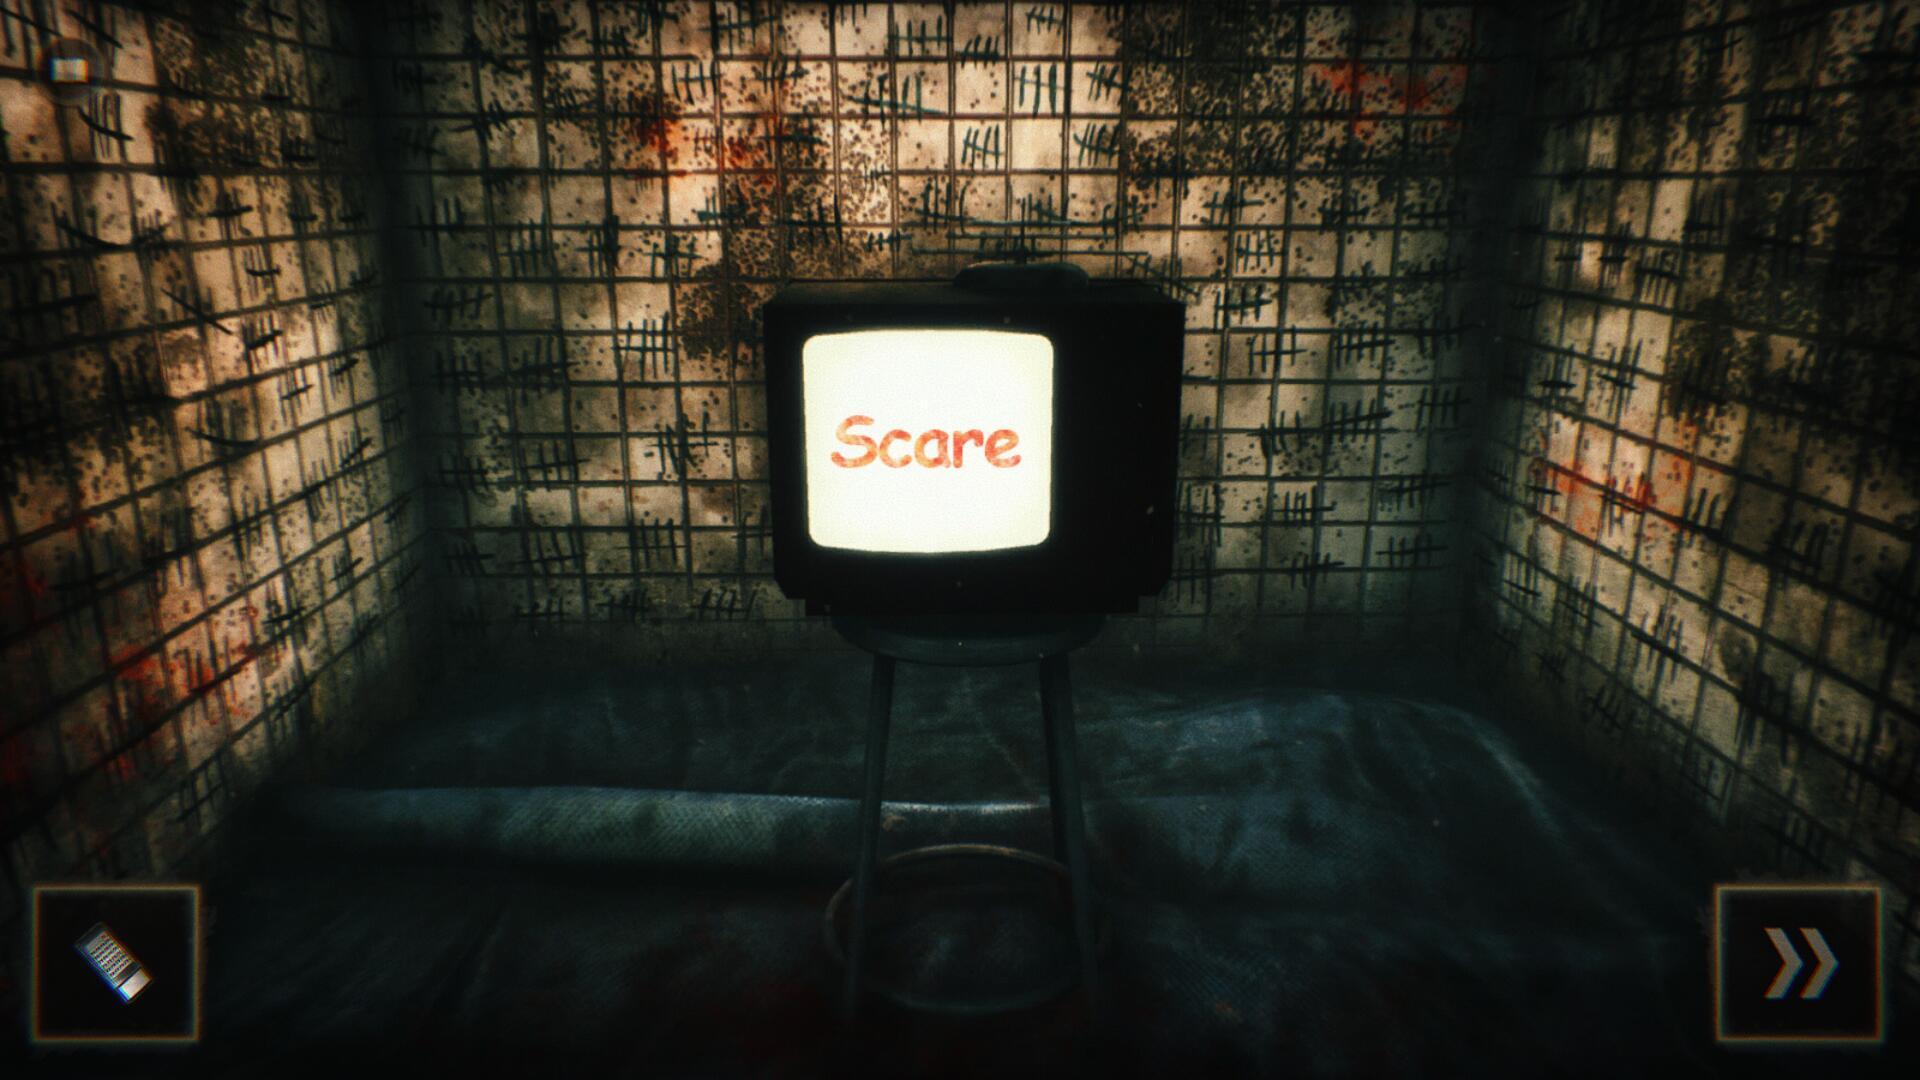 Darkroom游戏攻略 暗室普通难度第二章